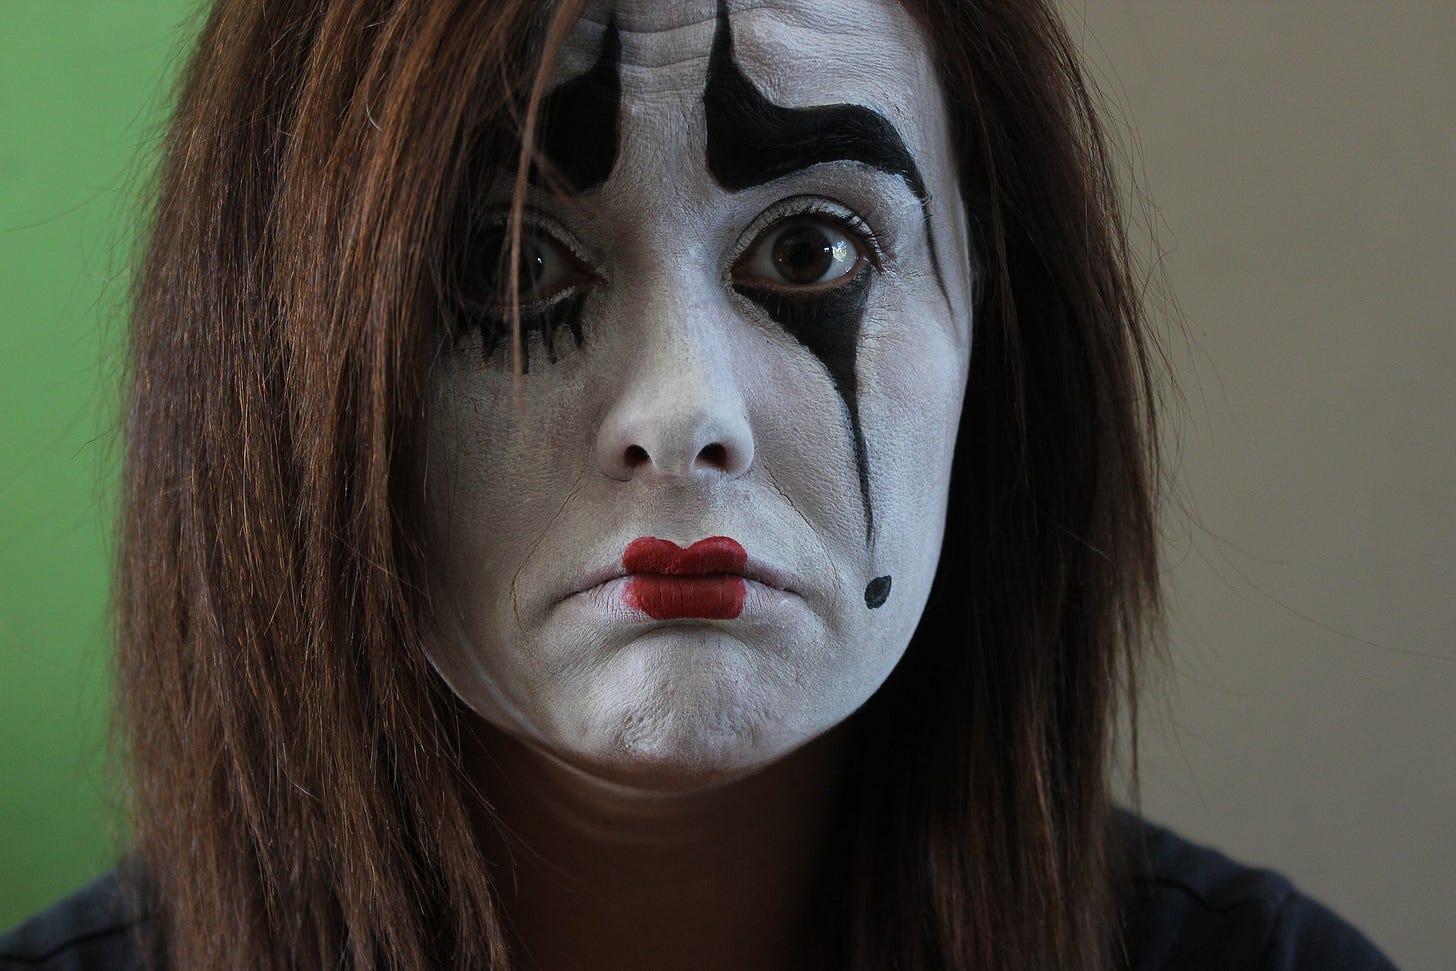 a sad looking female mime artist